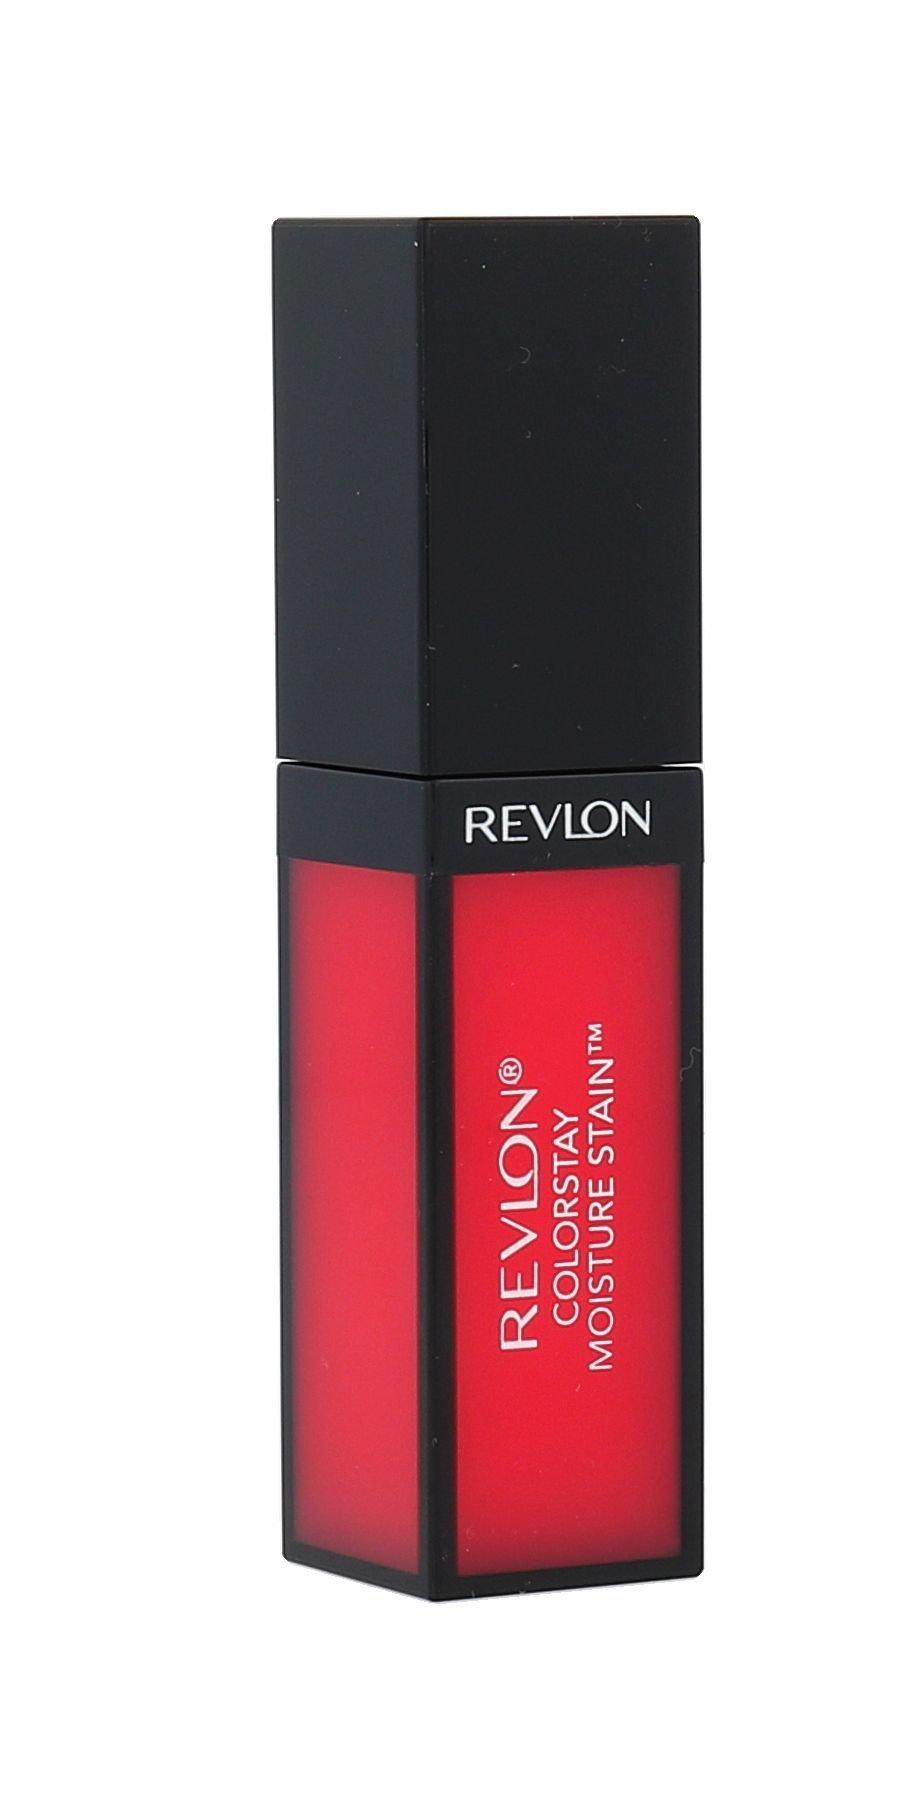 Revlon Colorstay Cosmetic 8ml 020 Rio Rush